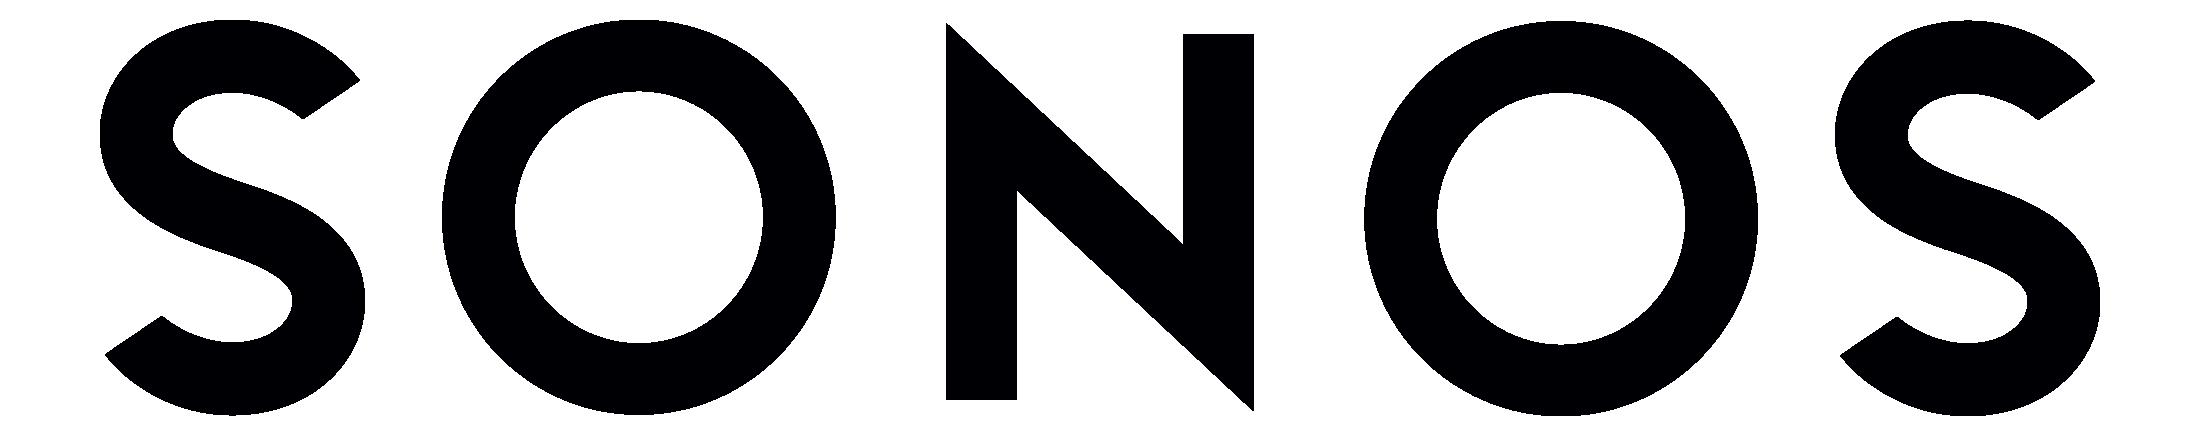 catalystcreativ catalystcreativ